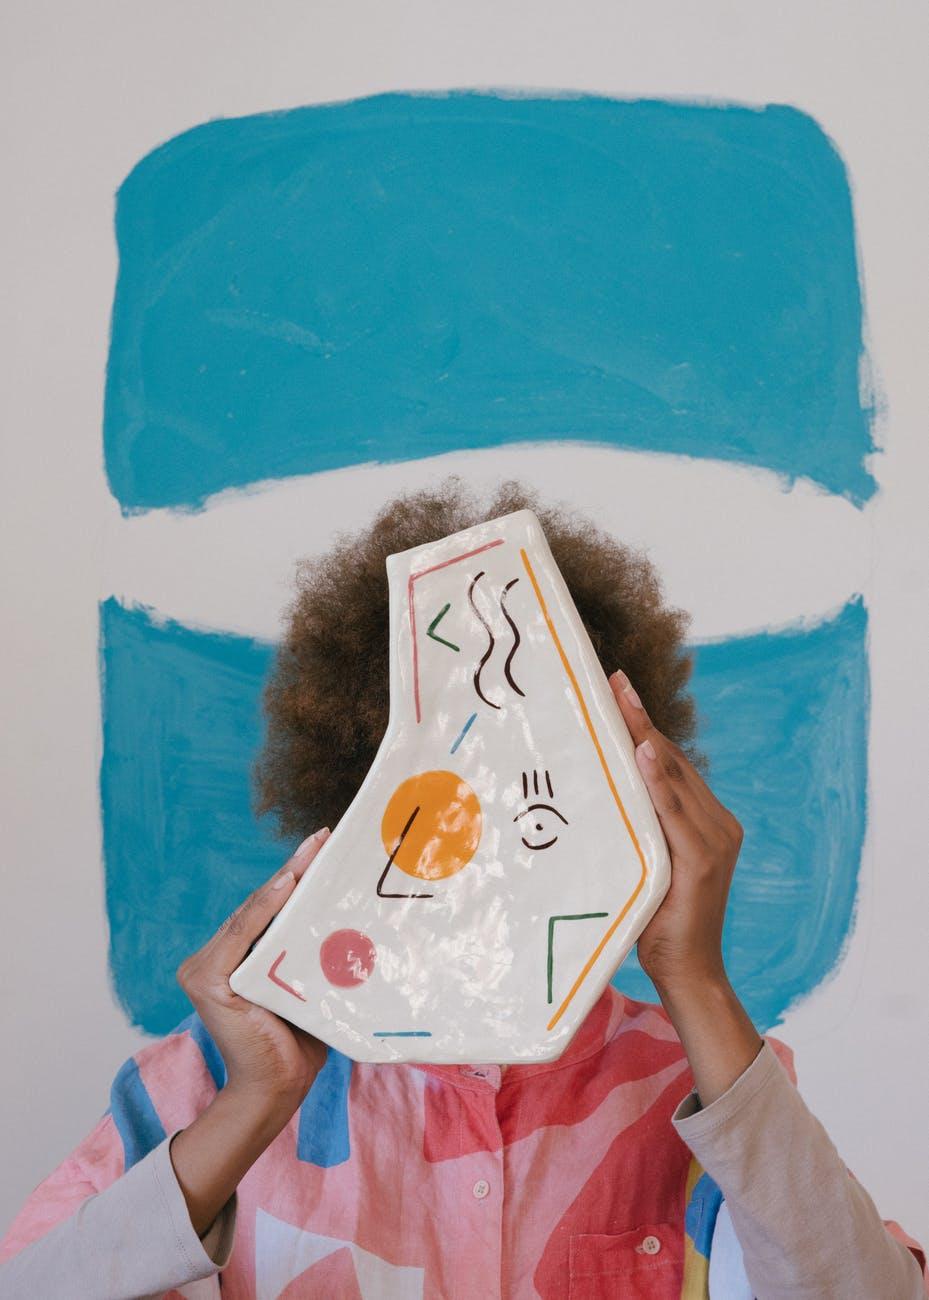 Artist holding up ceramic art